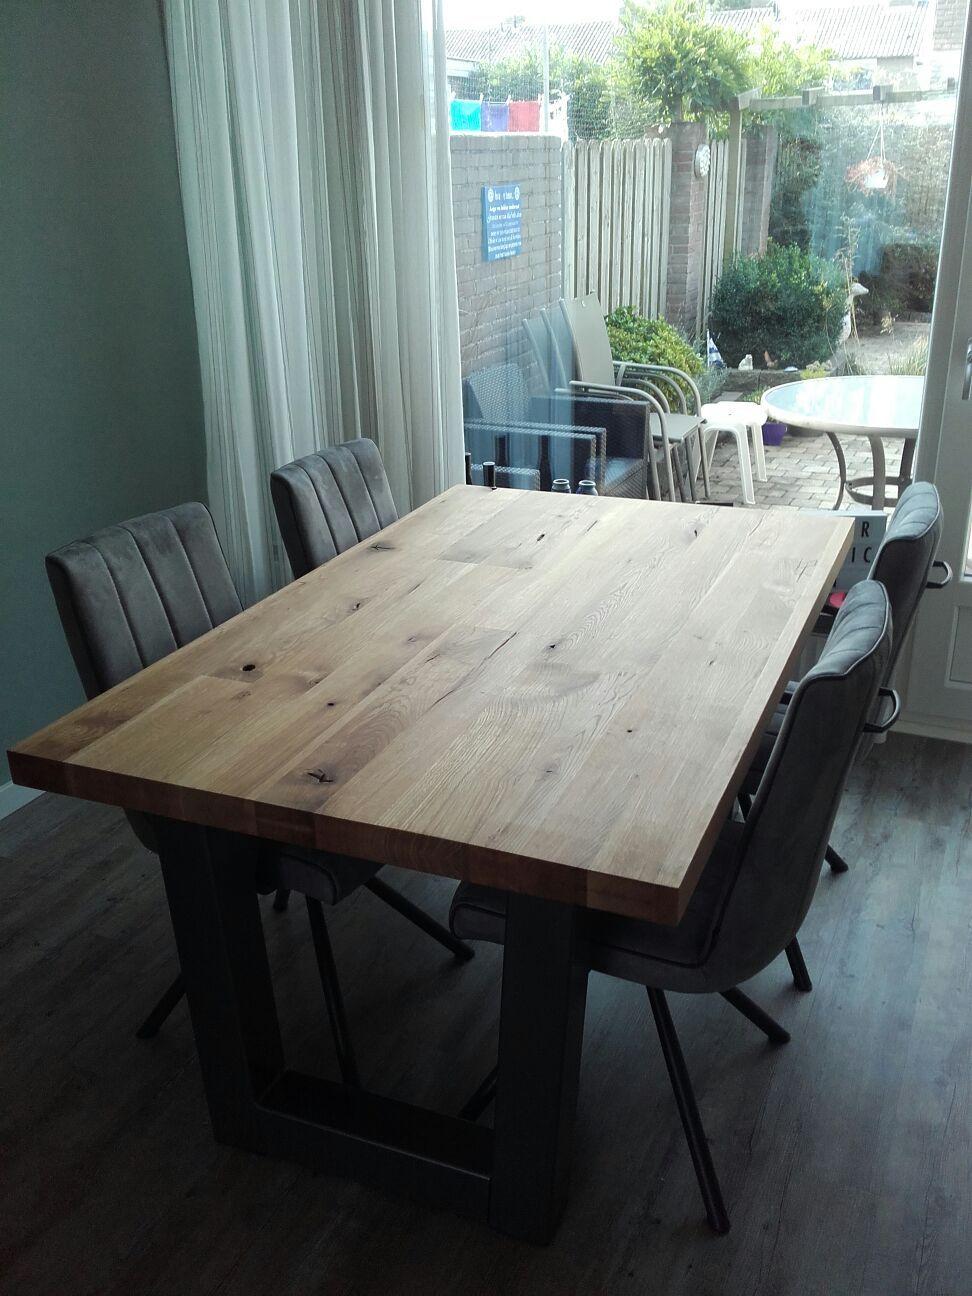 Schitterende Eetkamer Tafel.Schitterende Tafel Van H H Industrieel Vintage Dining Table